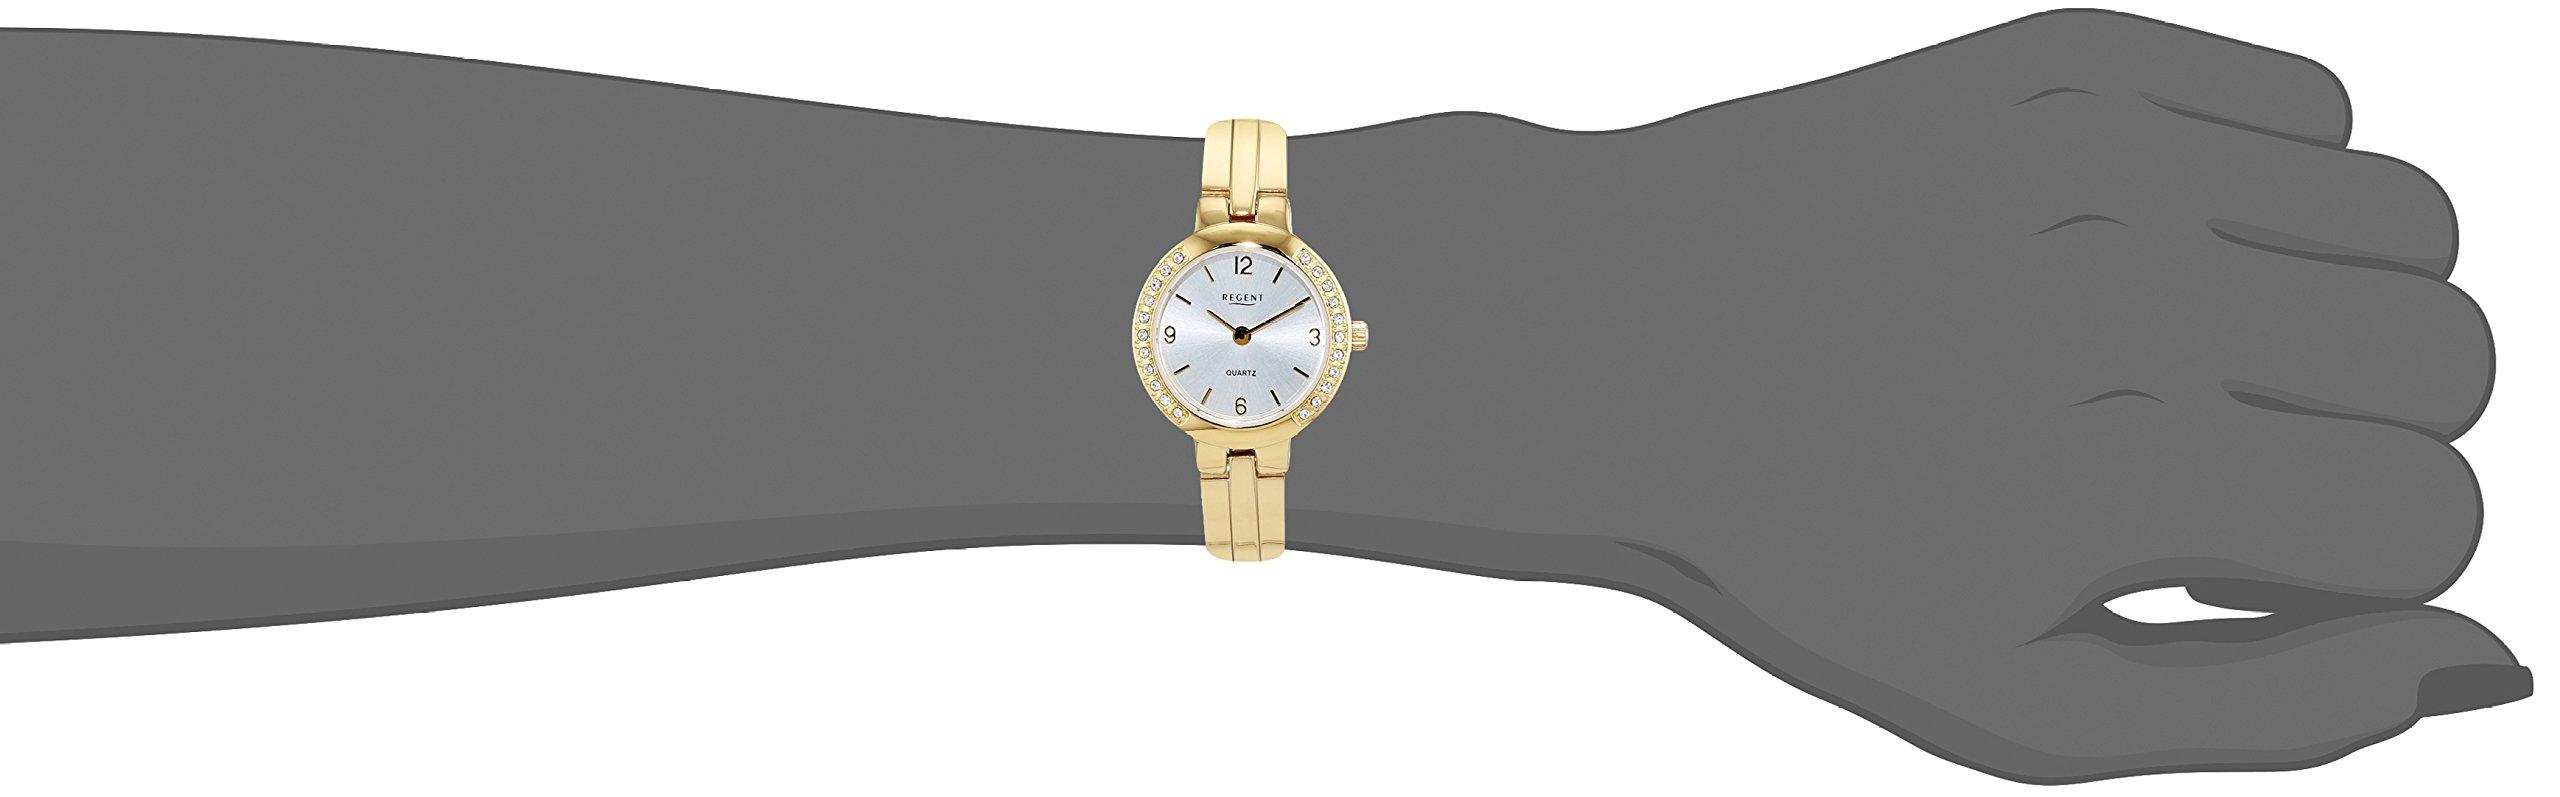 REGENT-Damen-Analog-Quarz-Uhr-mit-Edelstahl-Armband-12210990